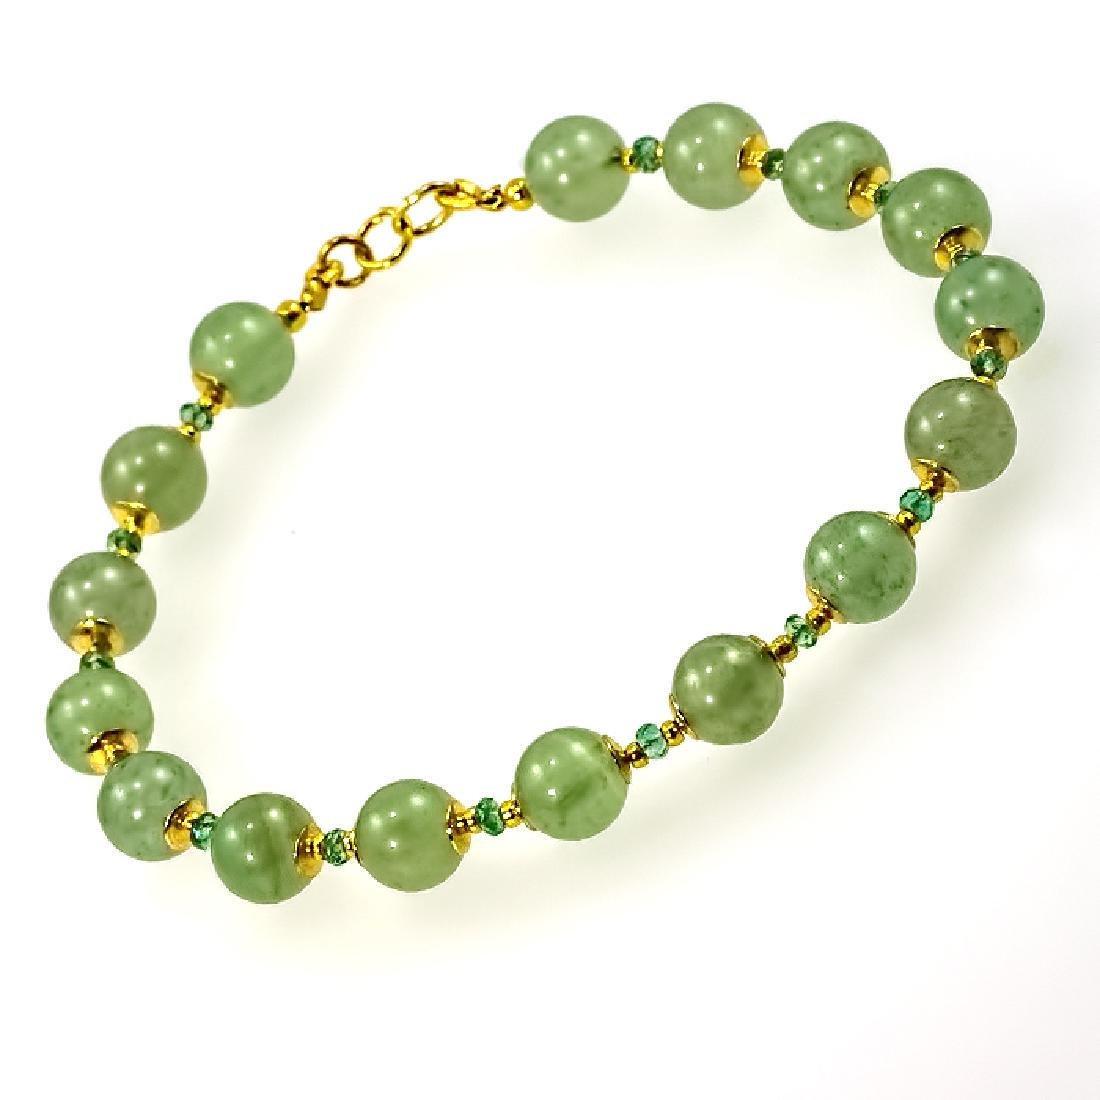 Nephrite and Emeralds 1.55ctw Bracelet - 2